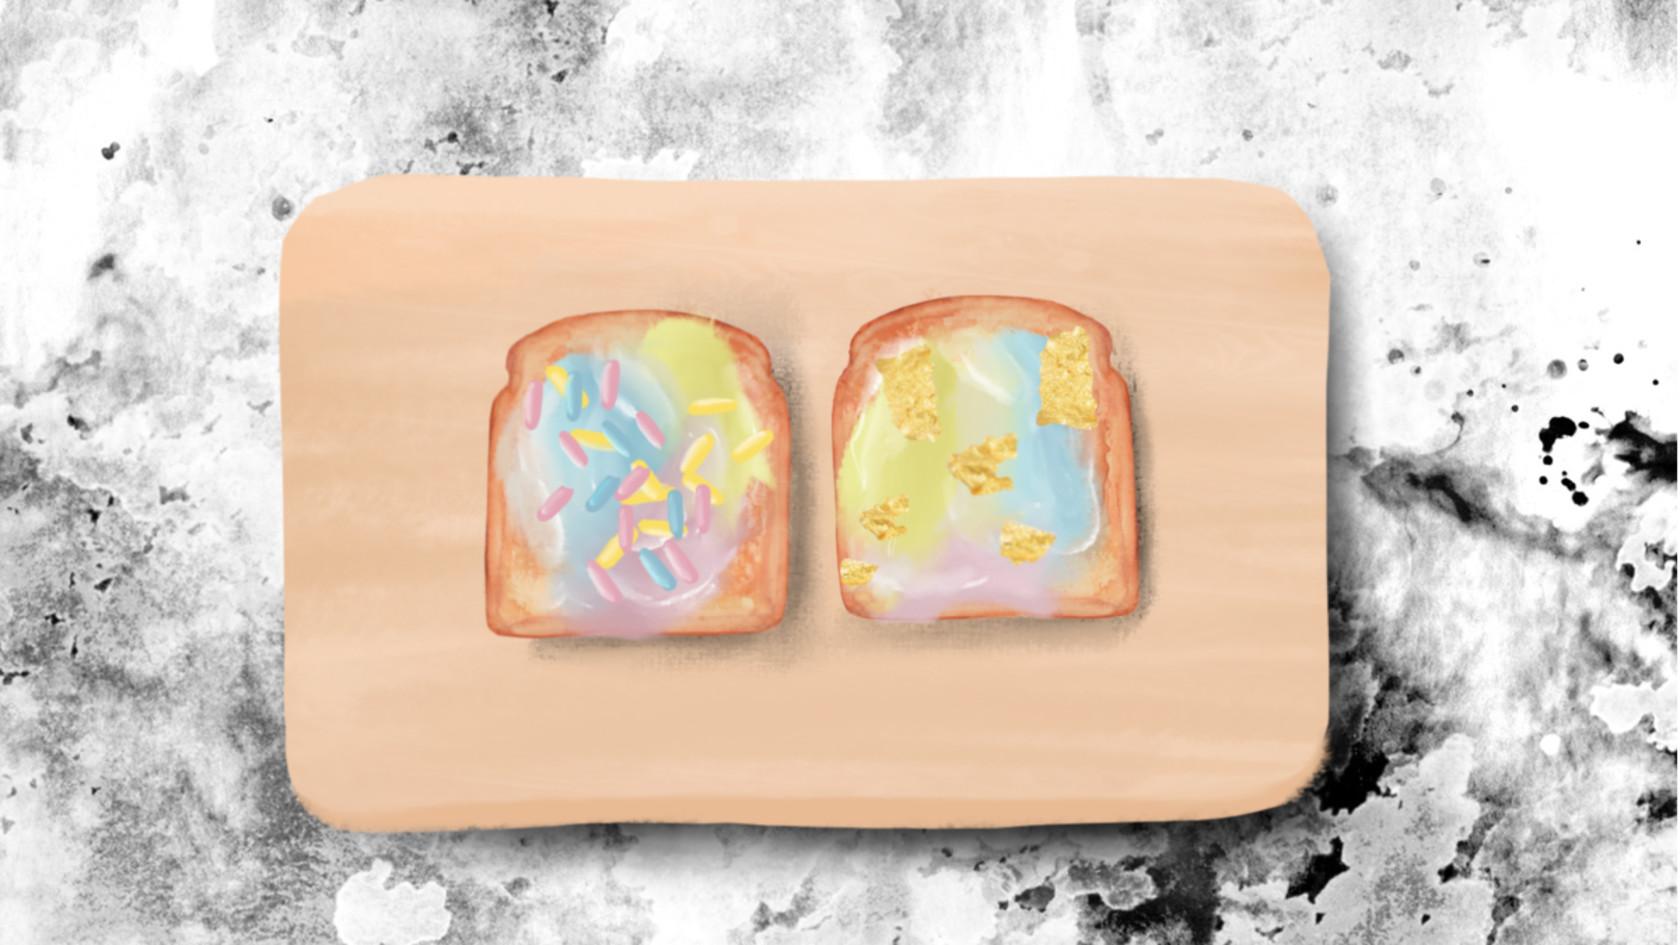 Unicorn toast 1200x675